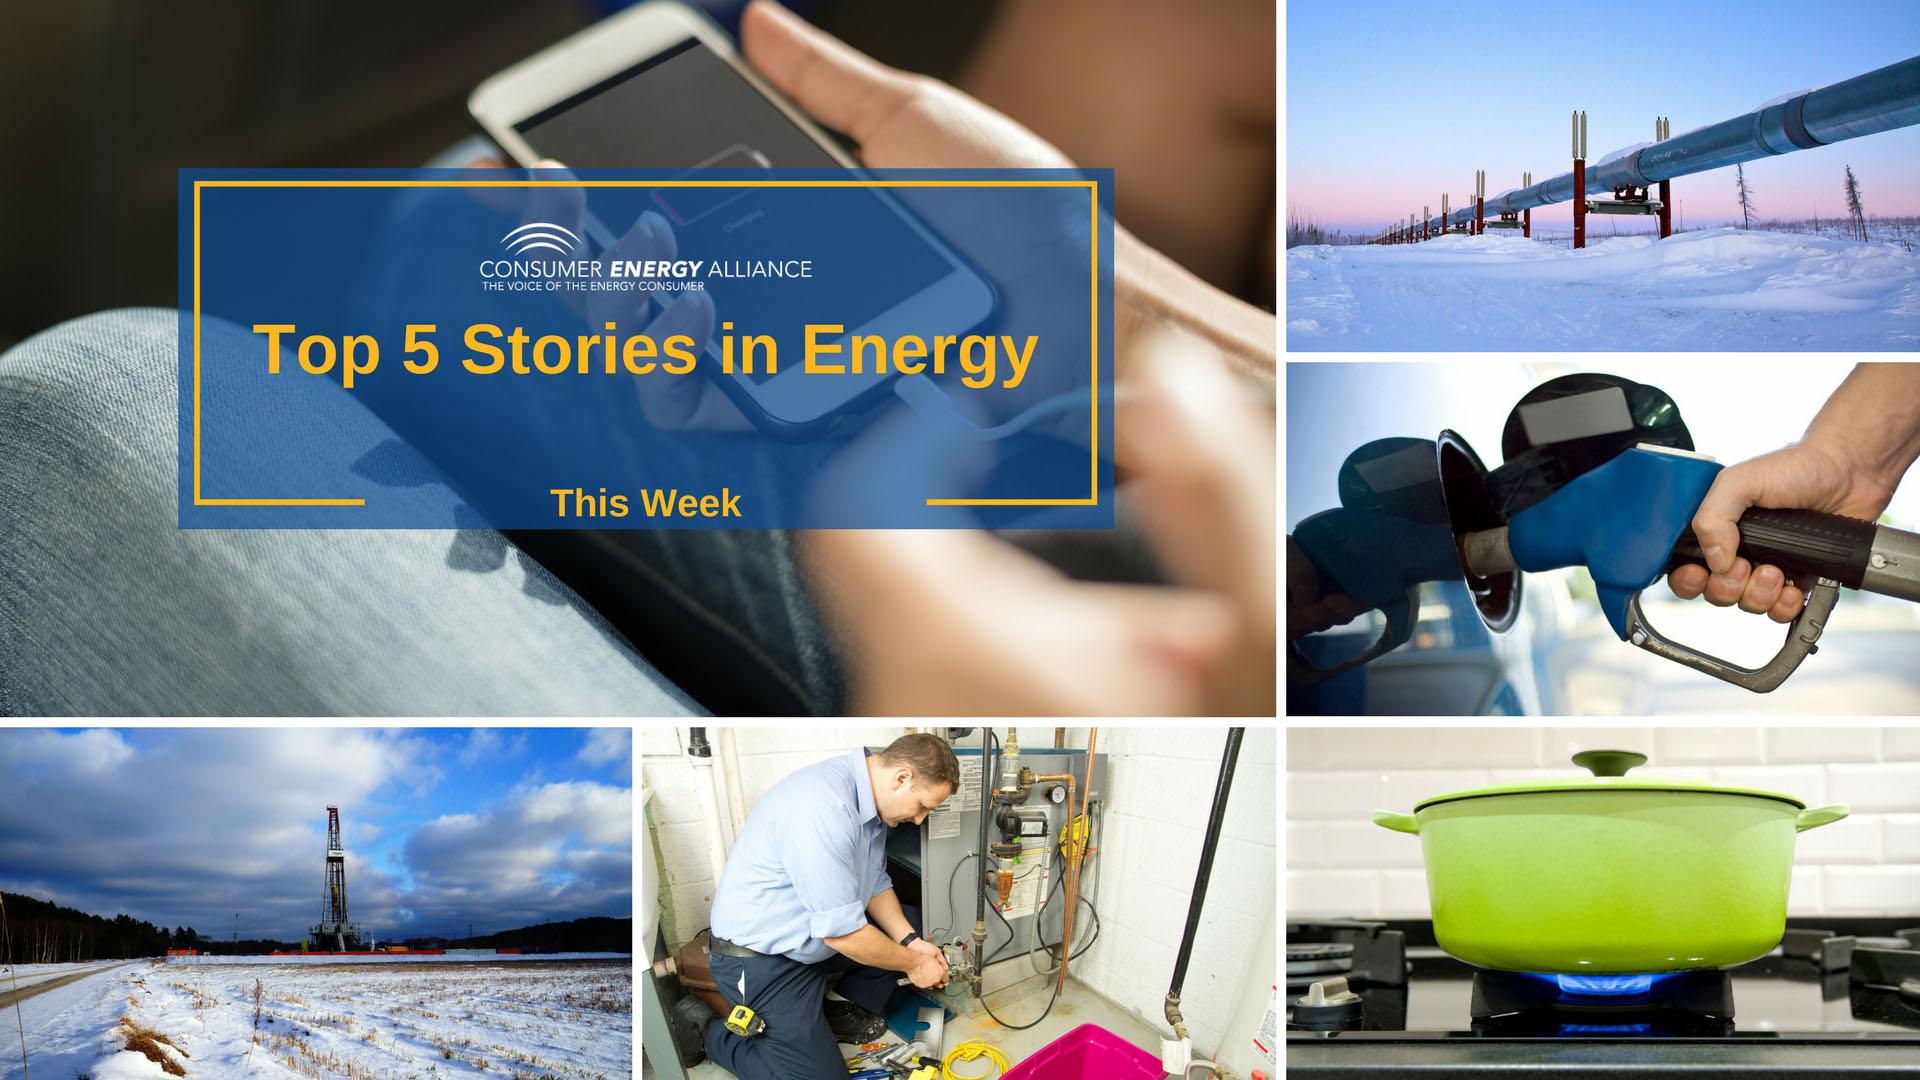 Top 5 Stories in Energy This Week - Consumer Energy Alliance